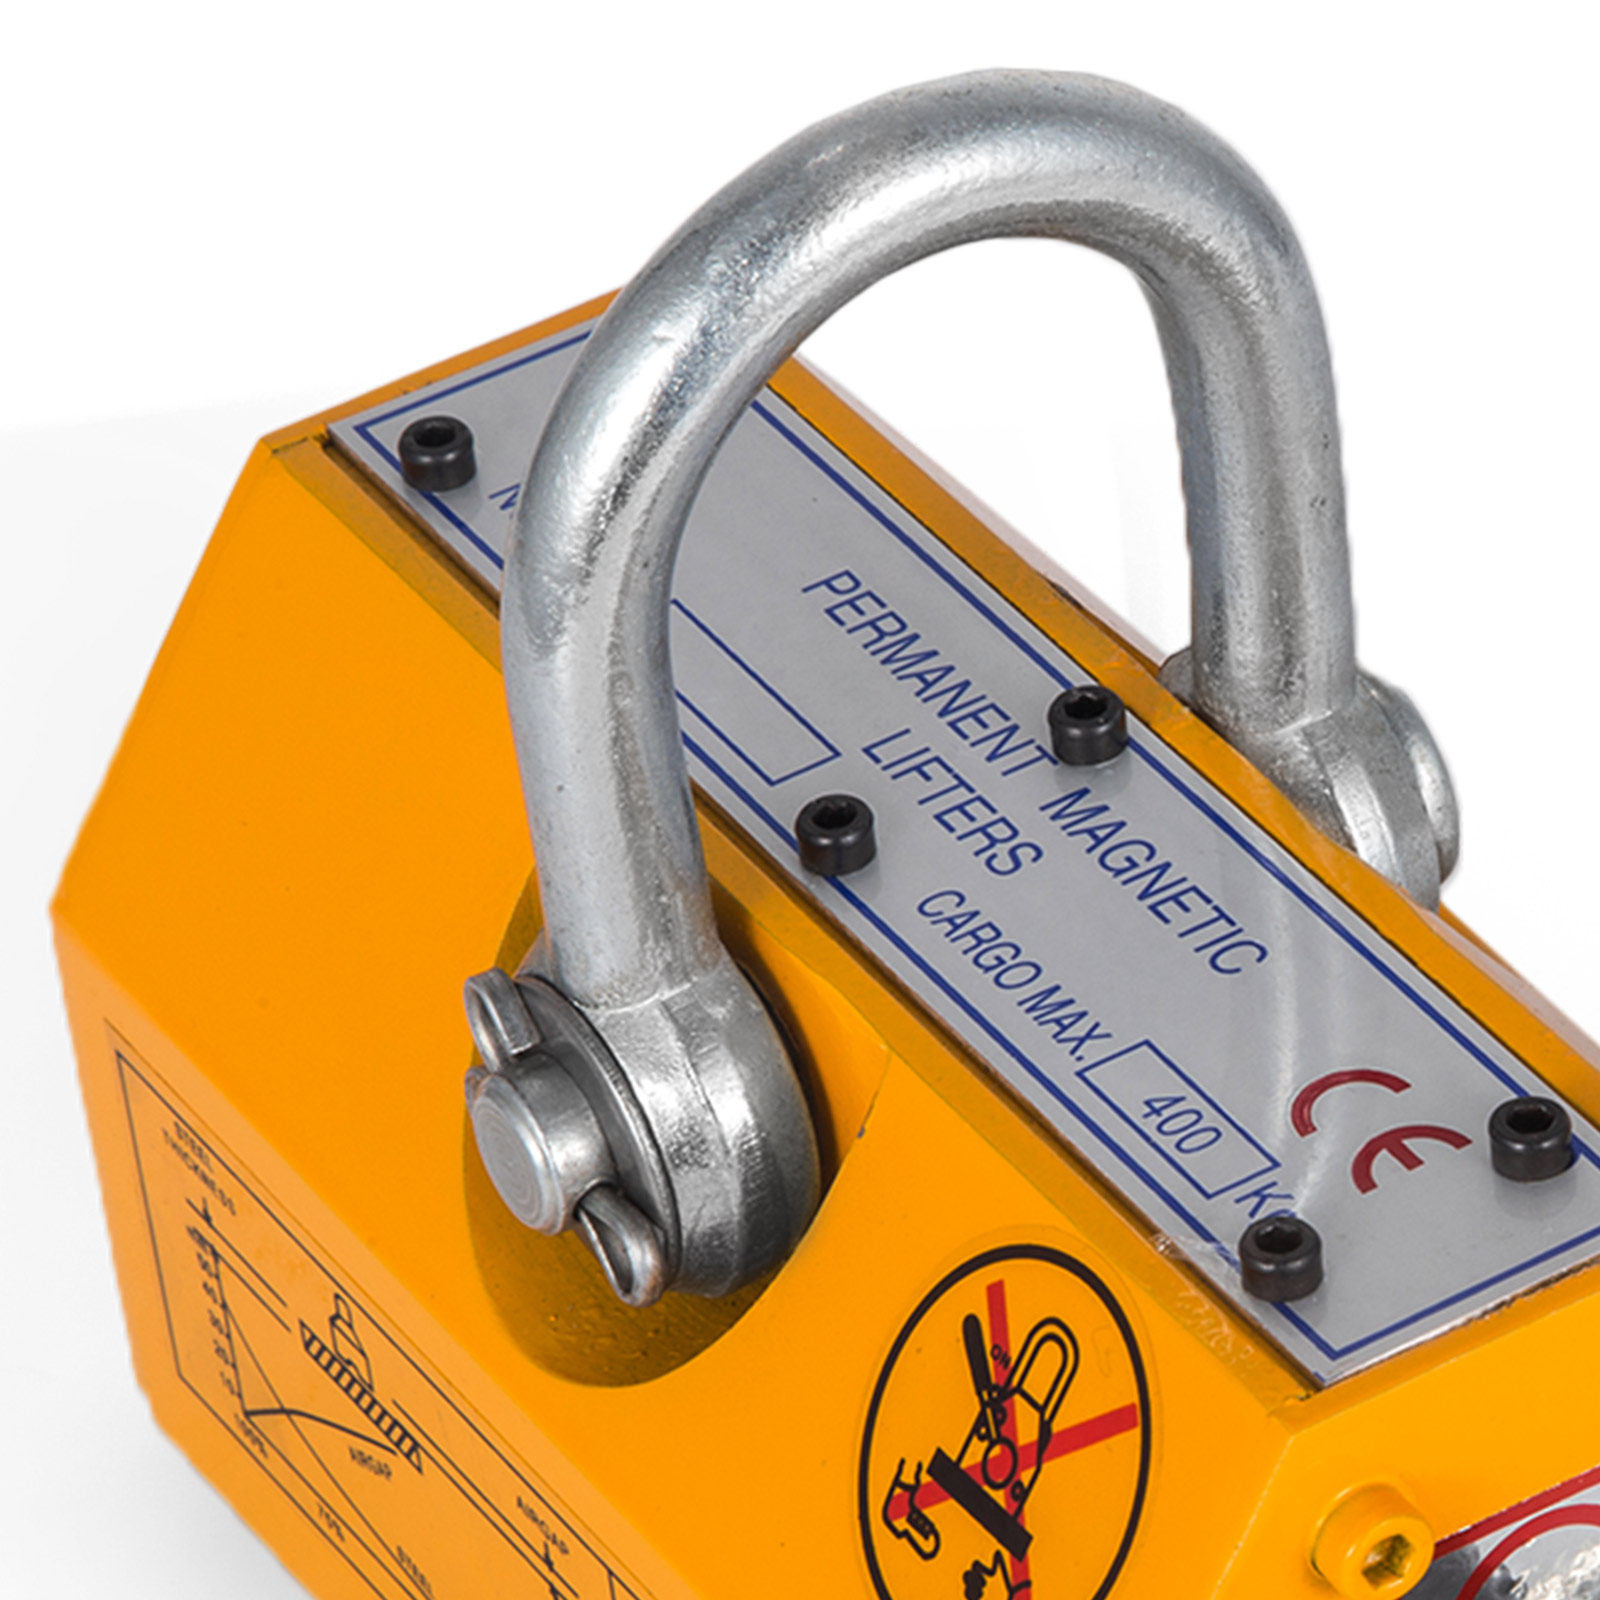 100-300-600-1000KG-Steel-Magnetic-Lifter-Heavy-Duty-Crane-Hoist-Lifting-Magnet miniature 43